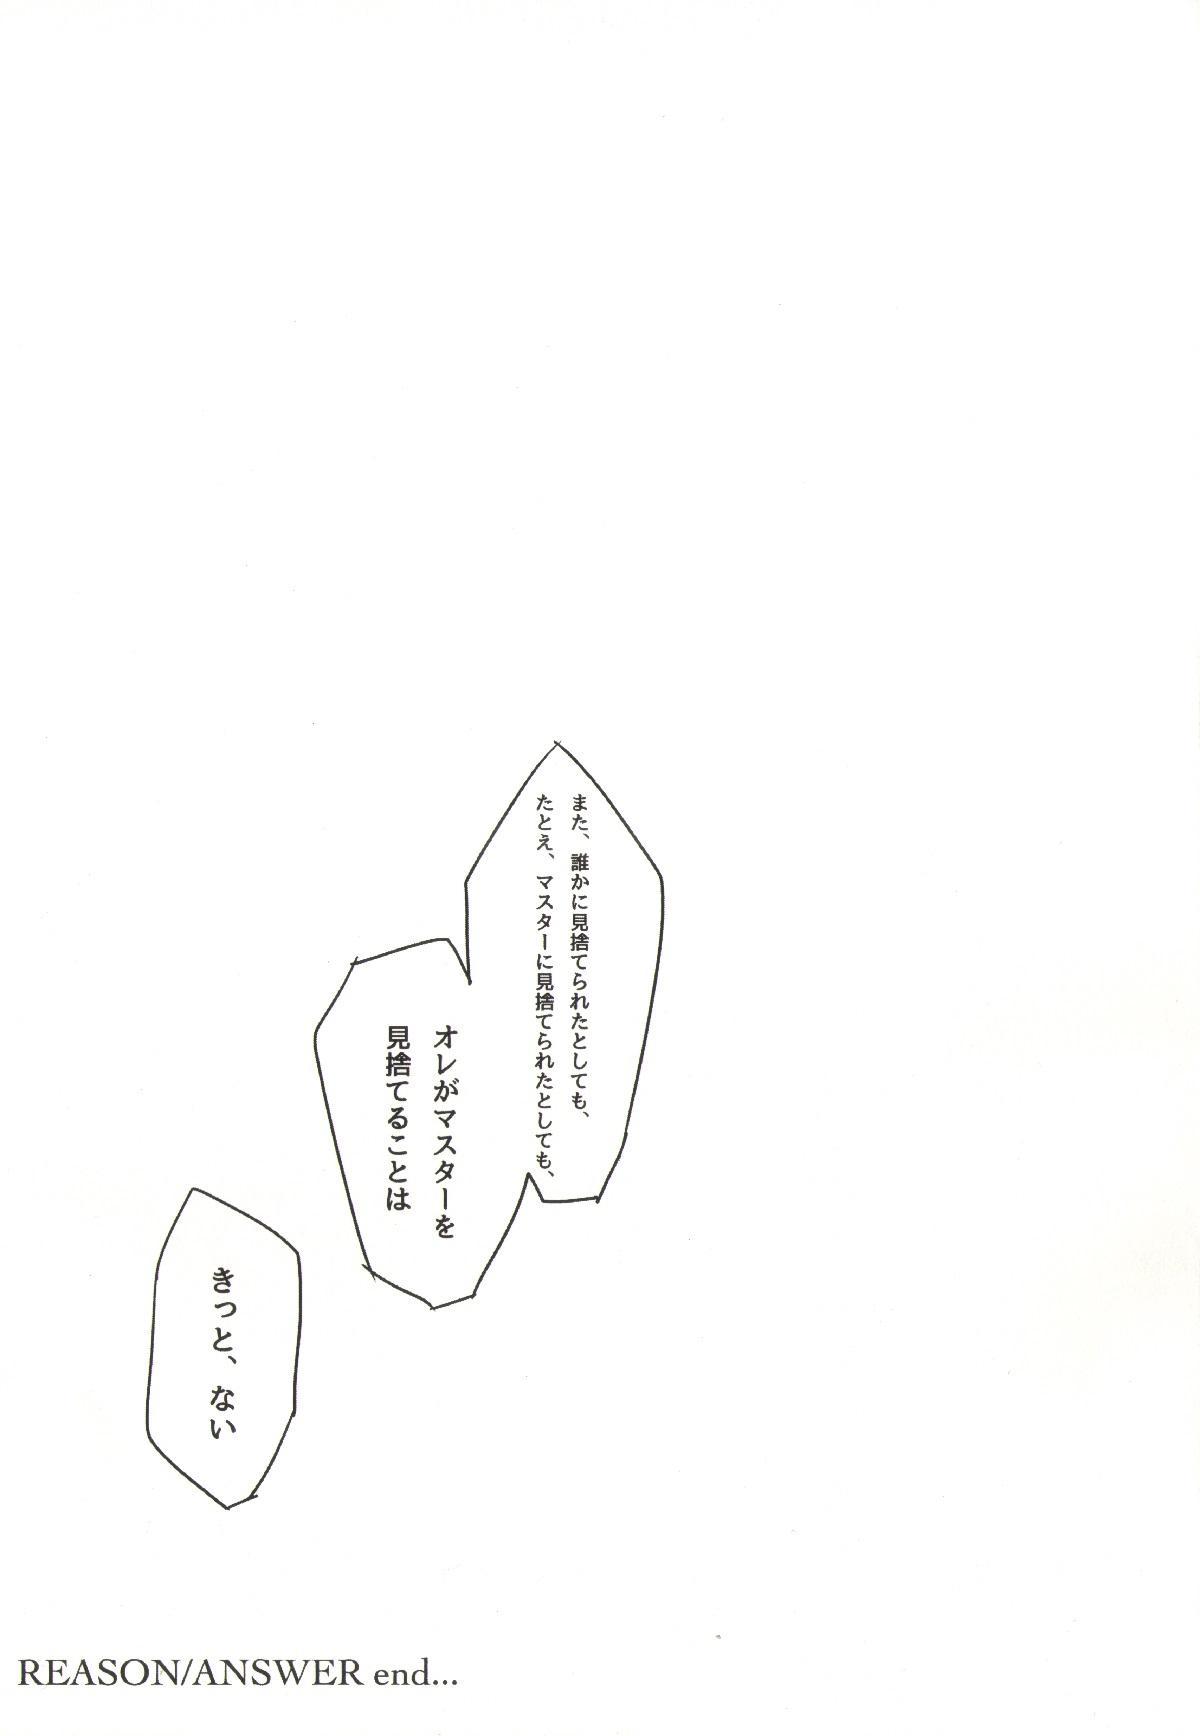 REASON/ANSWER 38